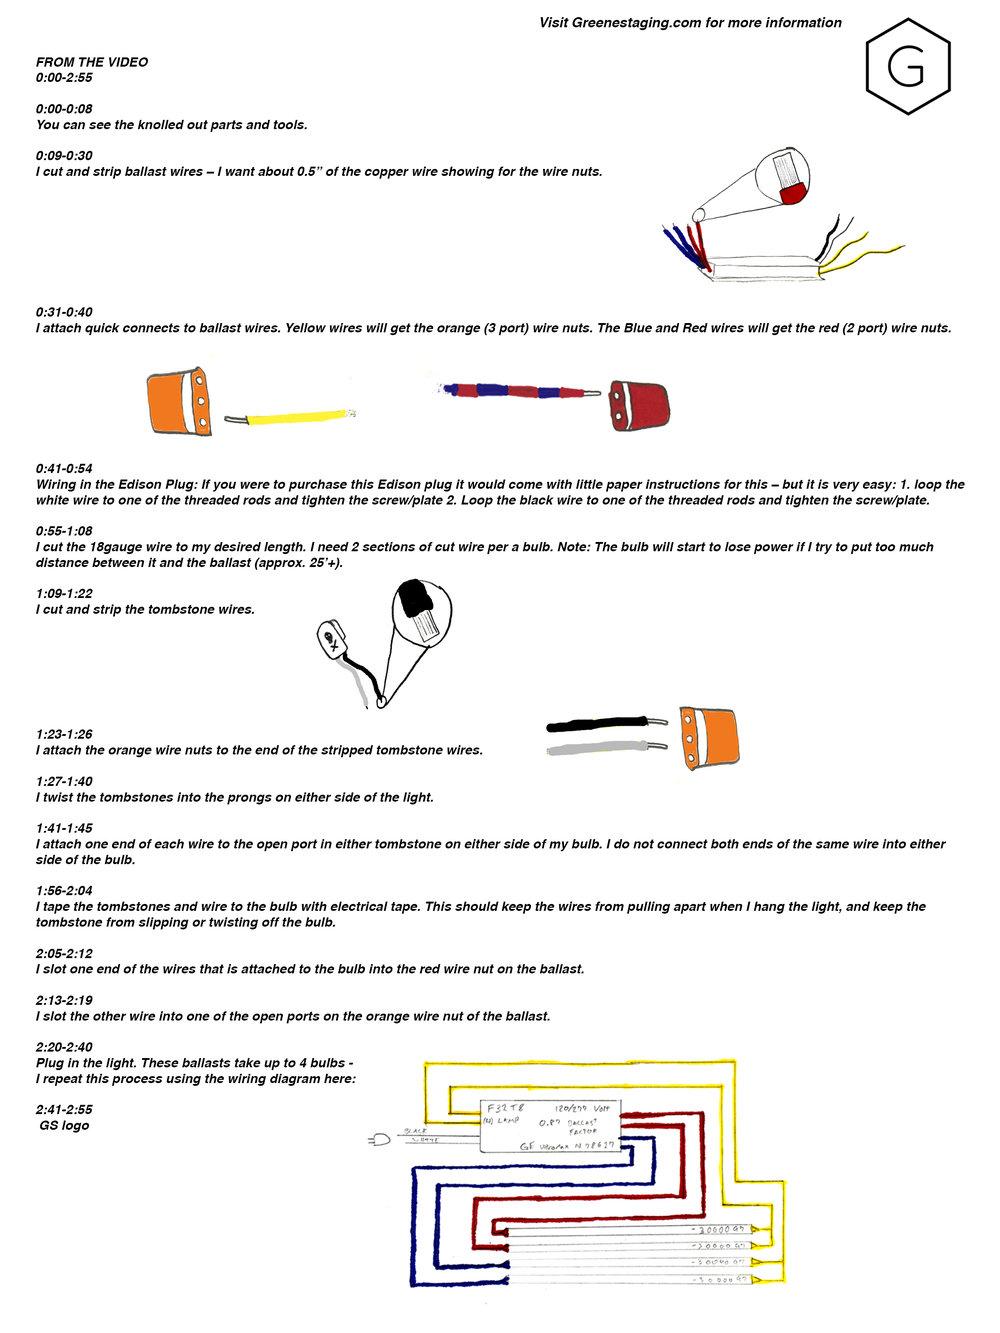 Fluorescent Bulb Process Haciendo Collective 4 Light Ballast Wiring Diagram Parallel Description